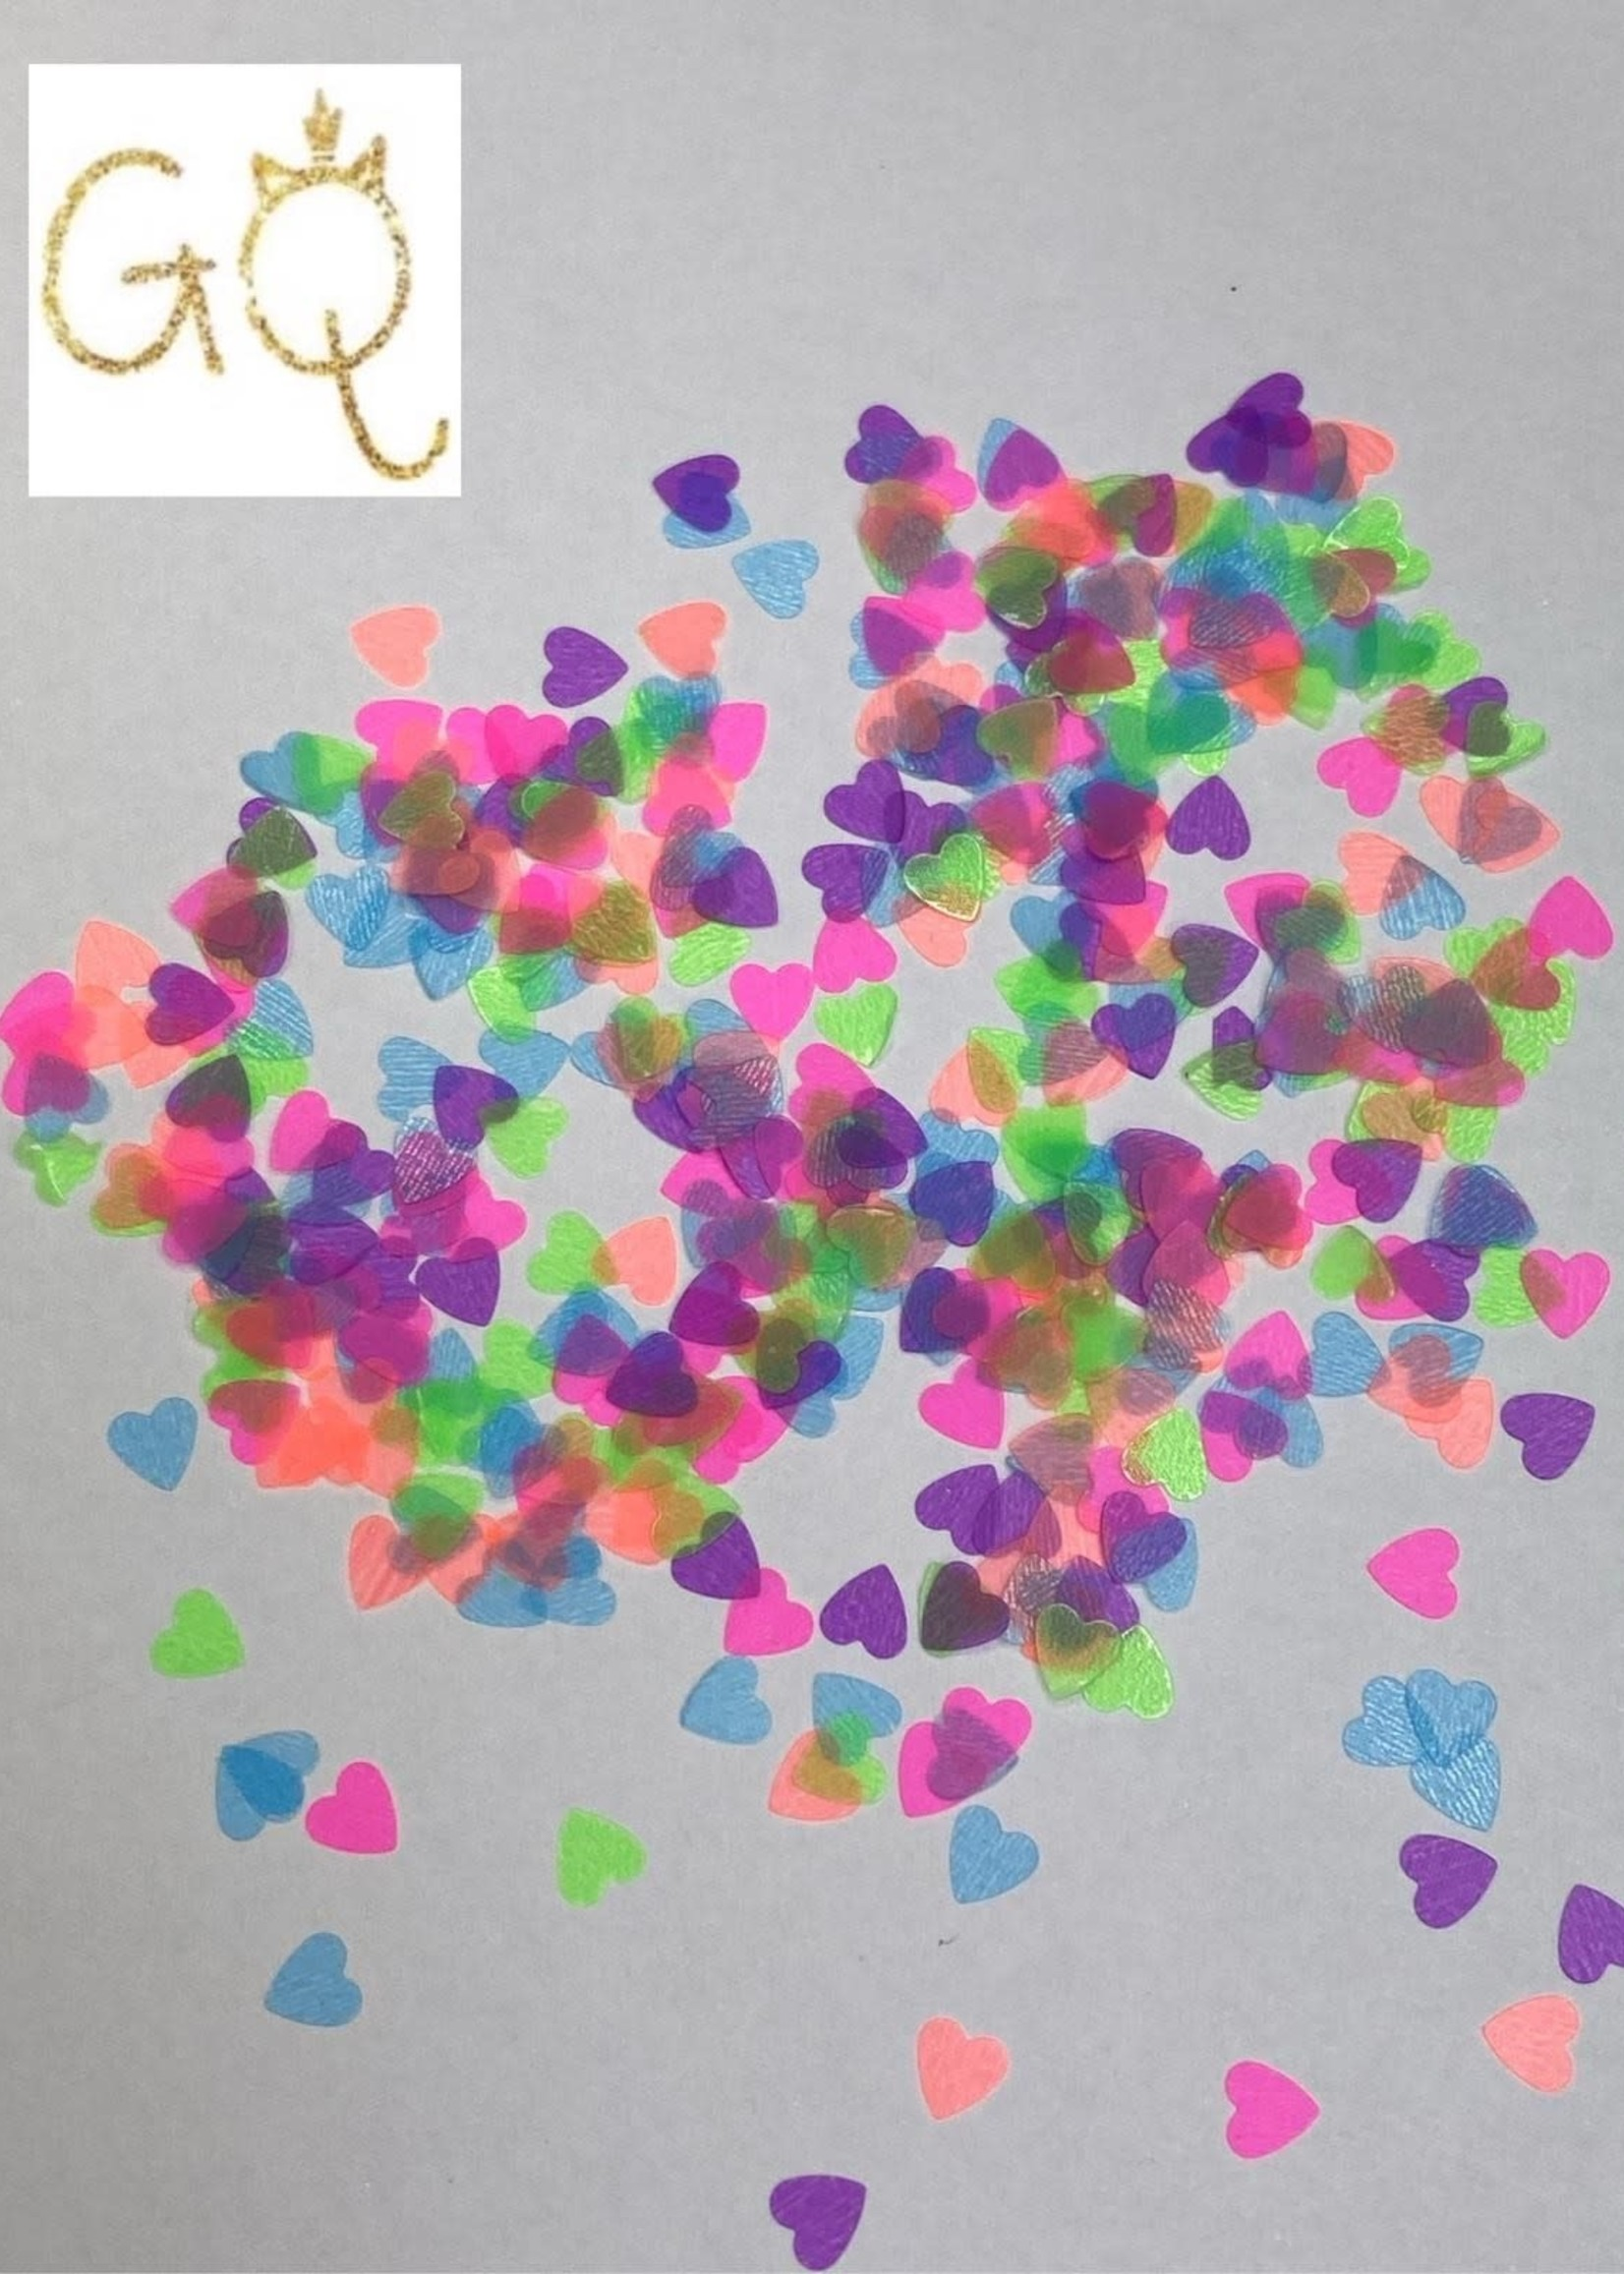 Glitter Queen Glass Neon Hearts